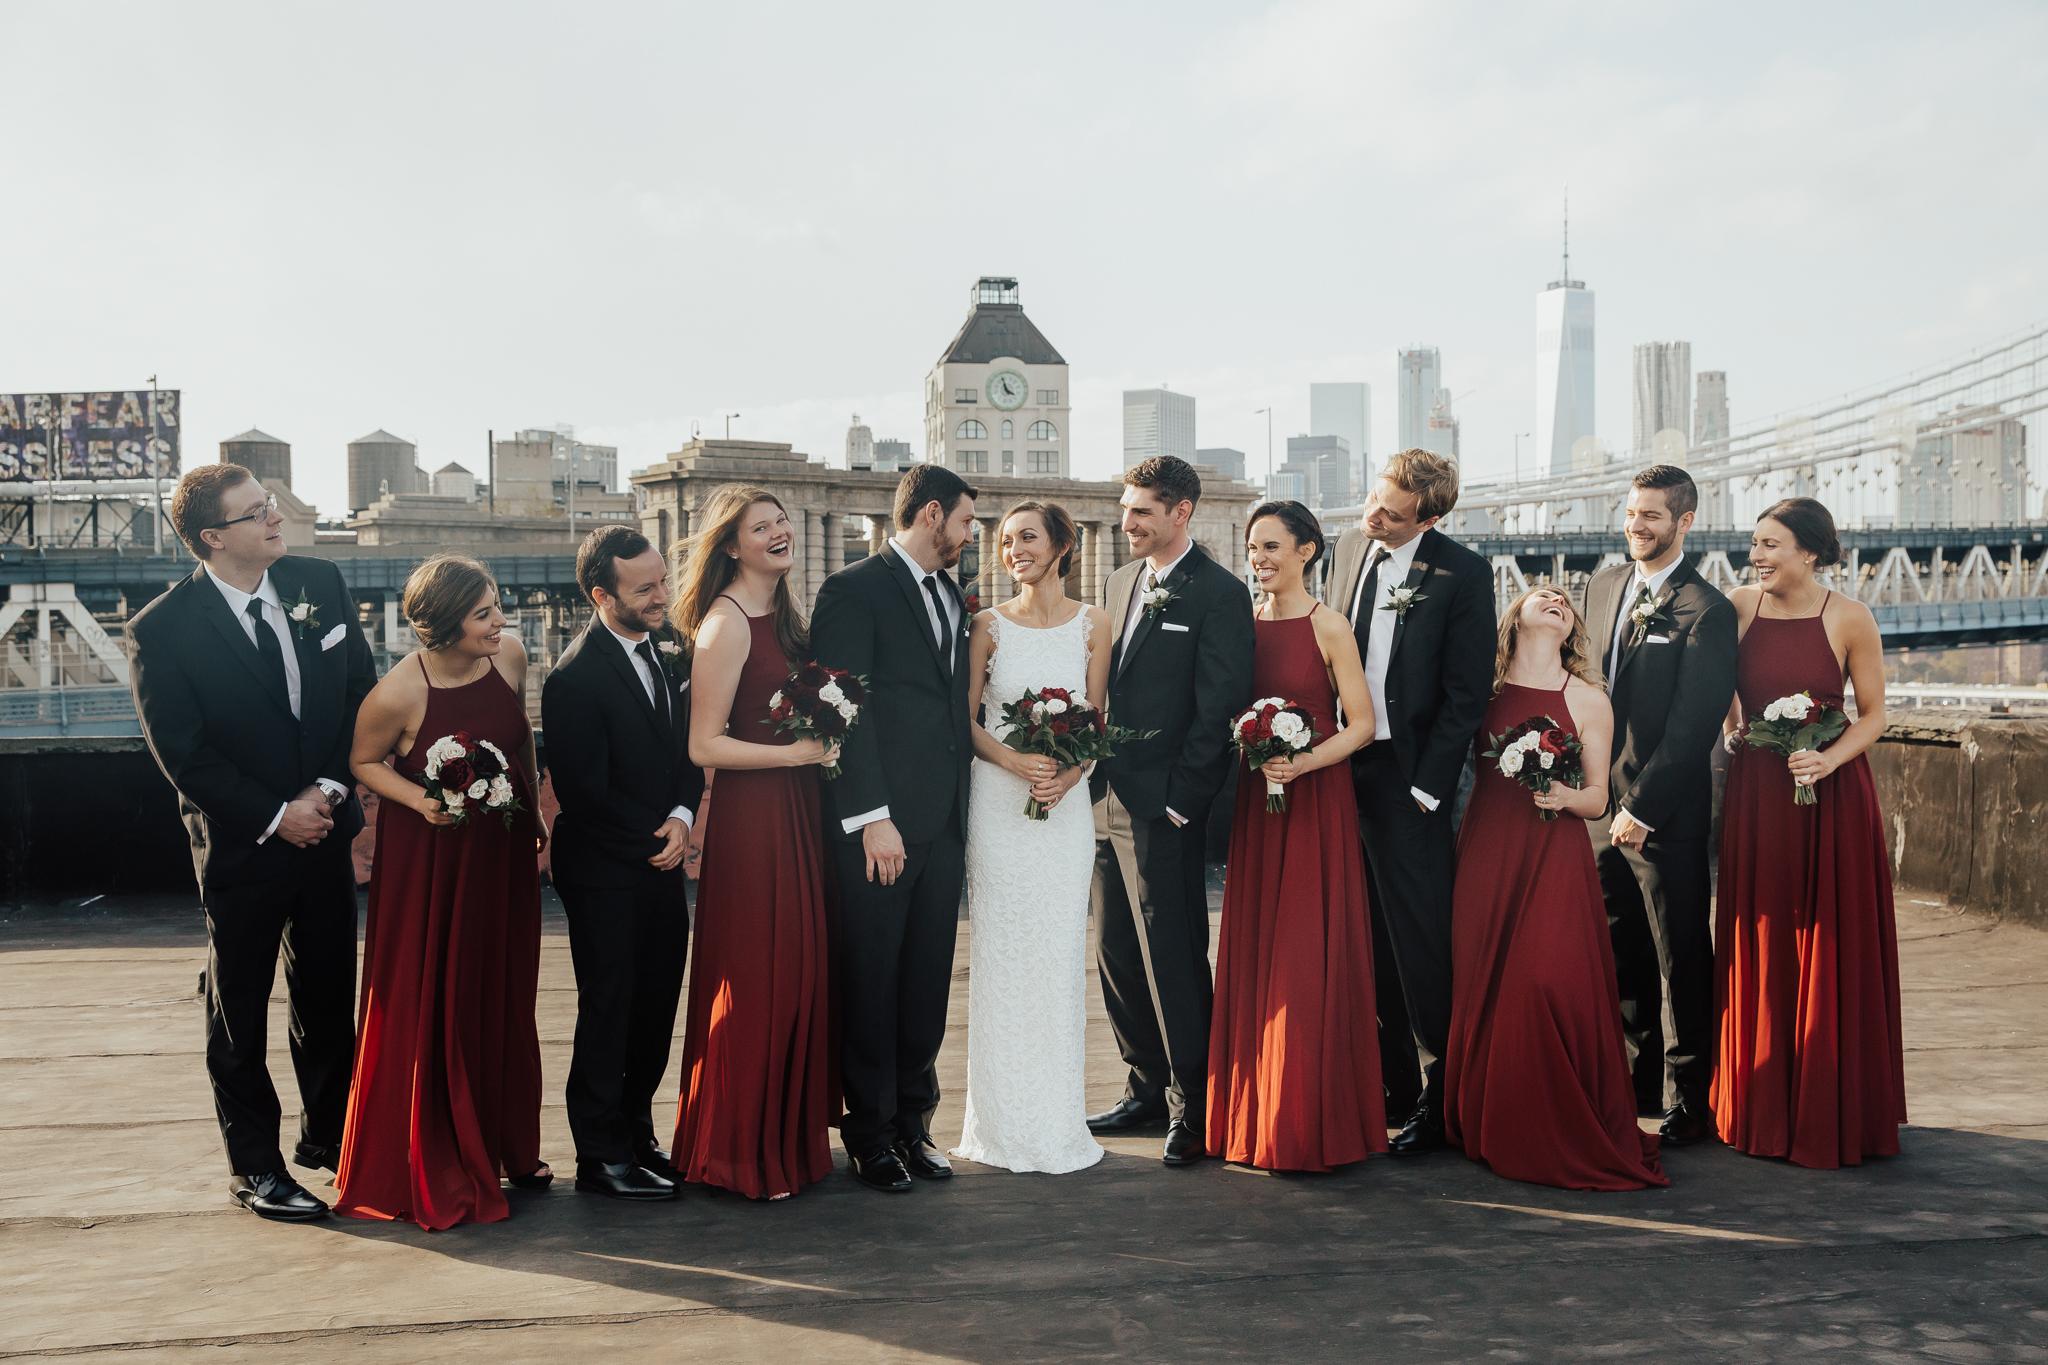 26-bridge-wedding-brooklyn-029.JPG